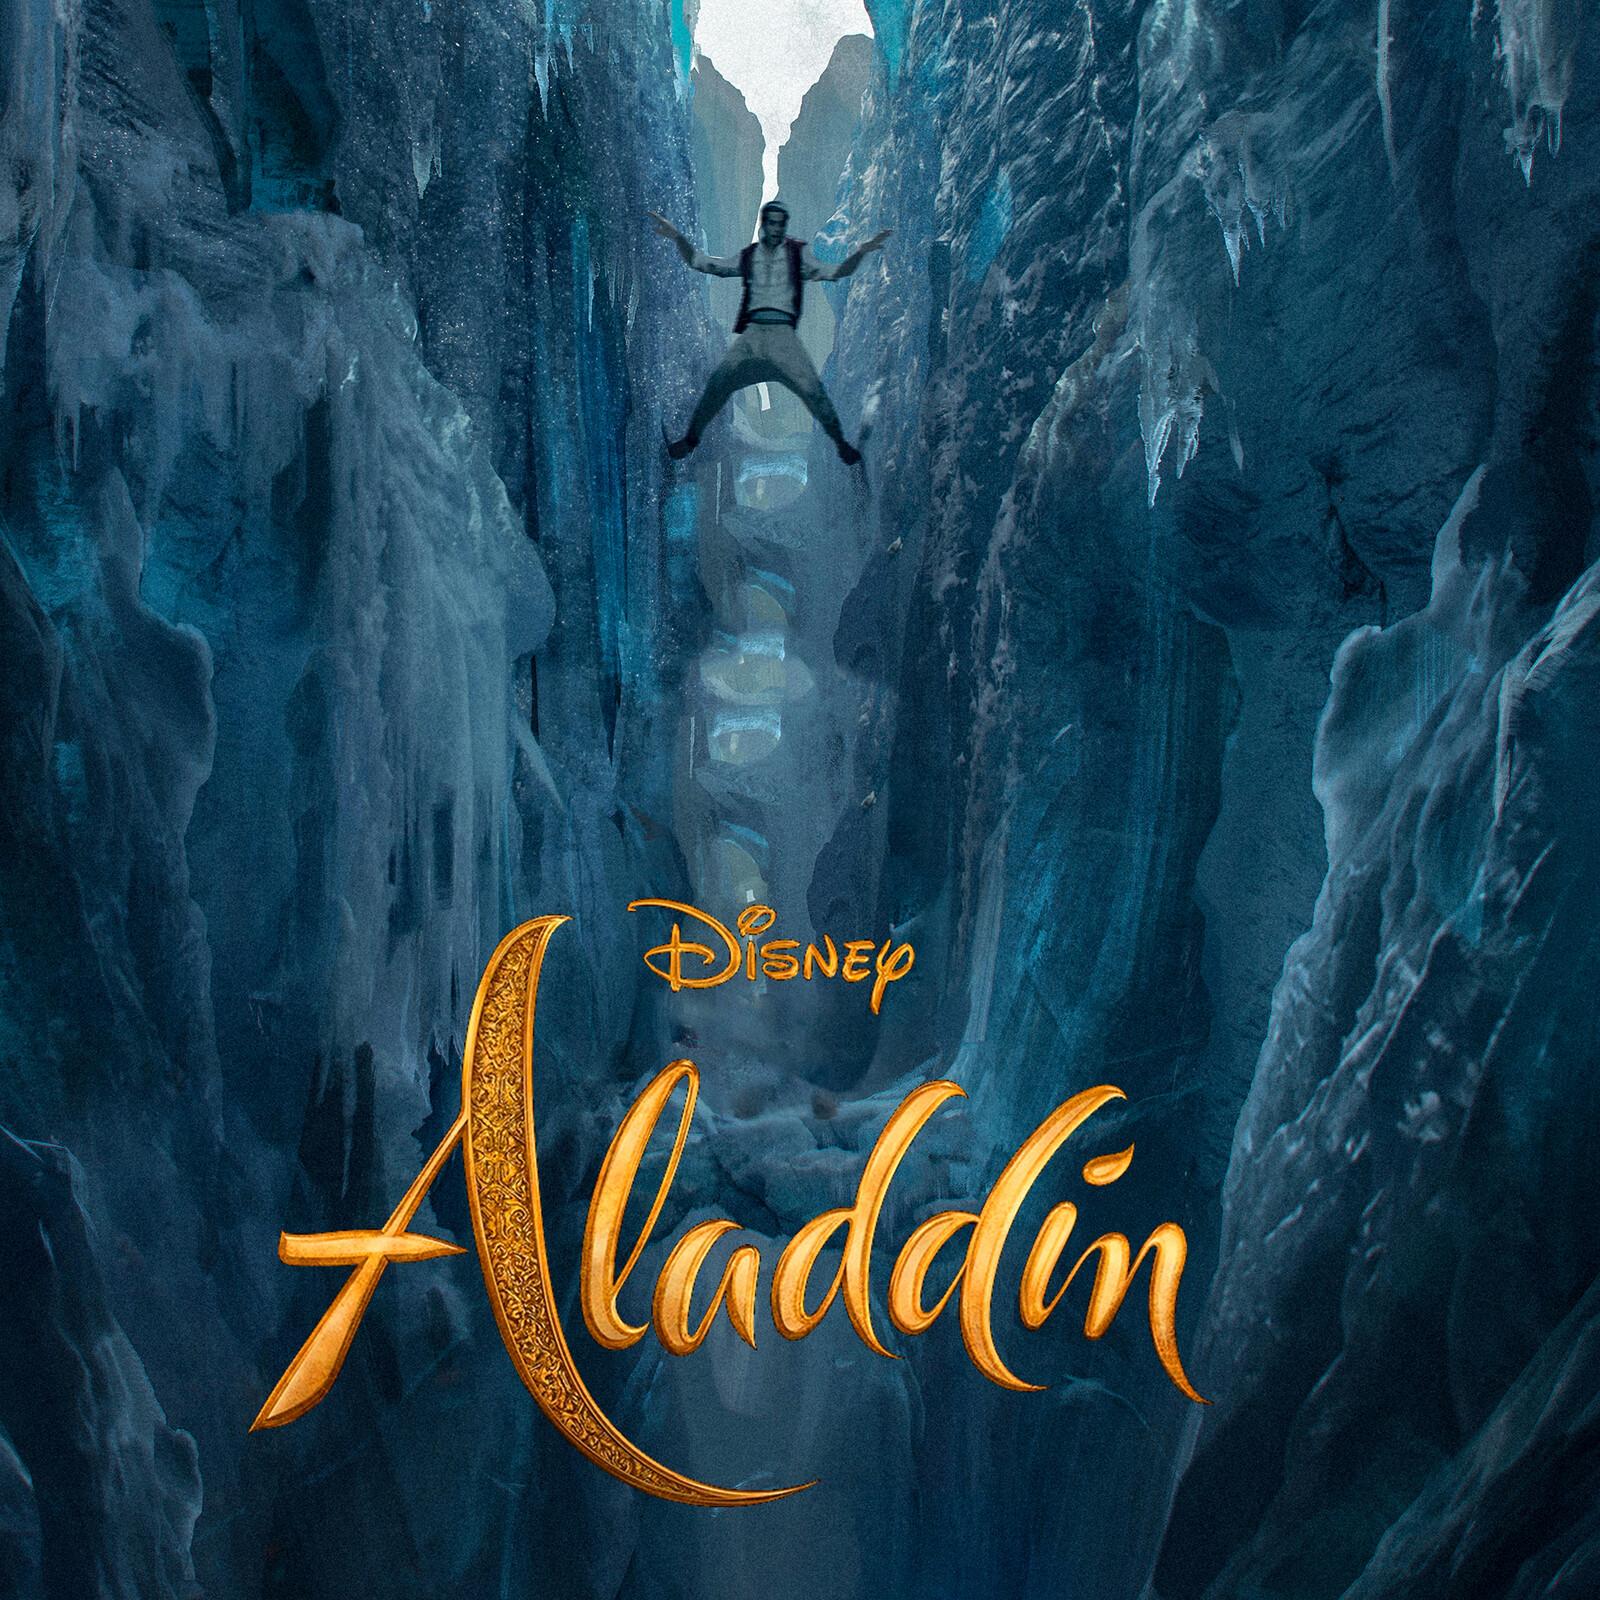 Aladdin.  The Frozen Tundra